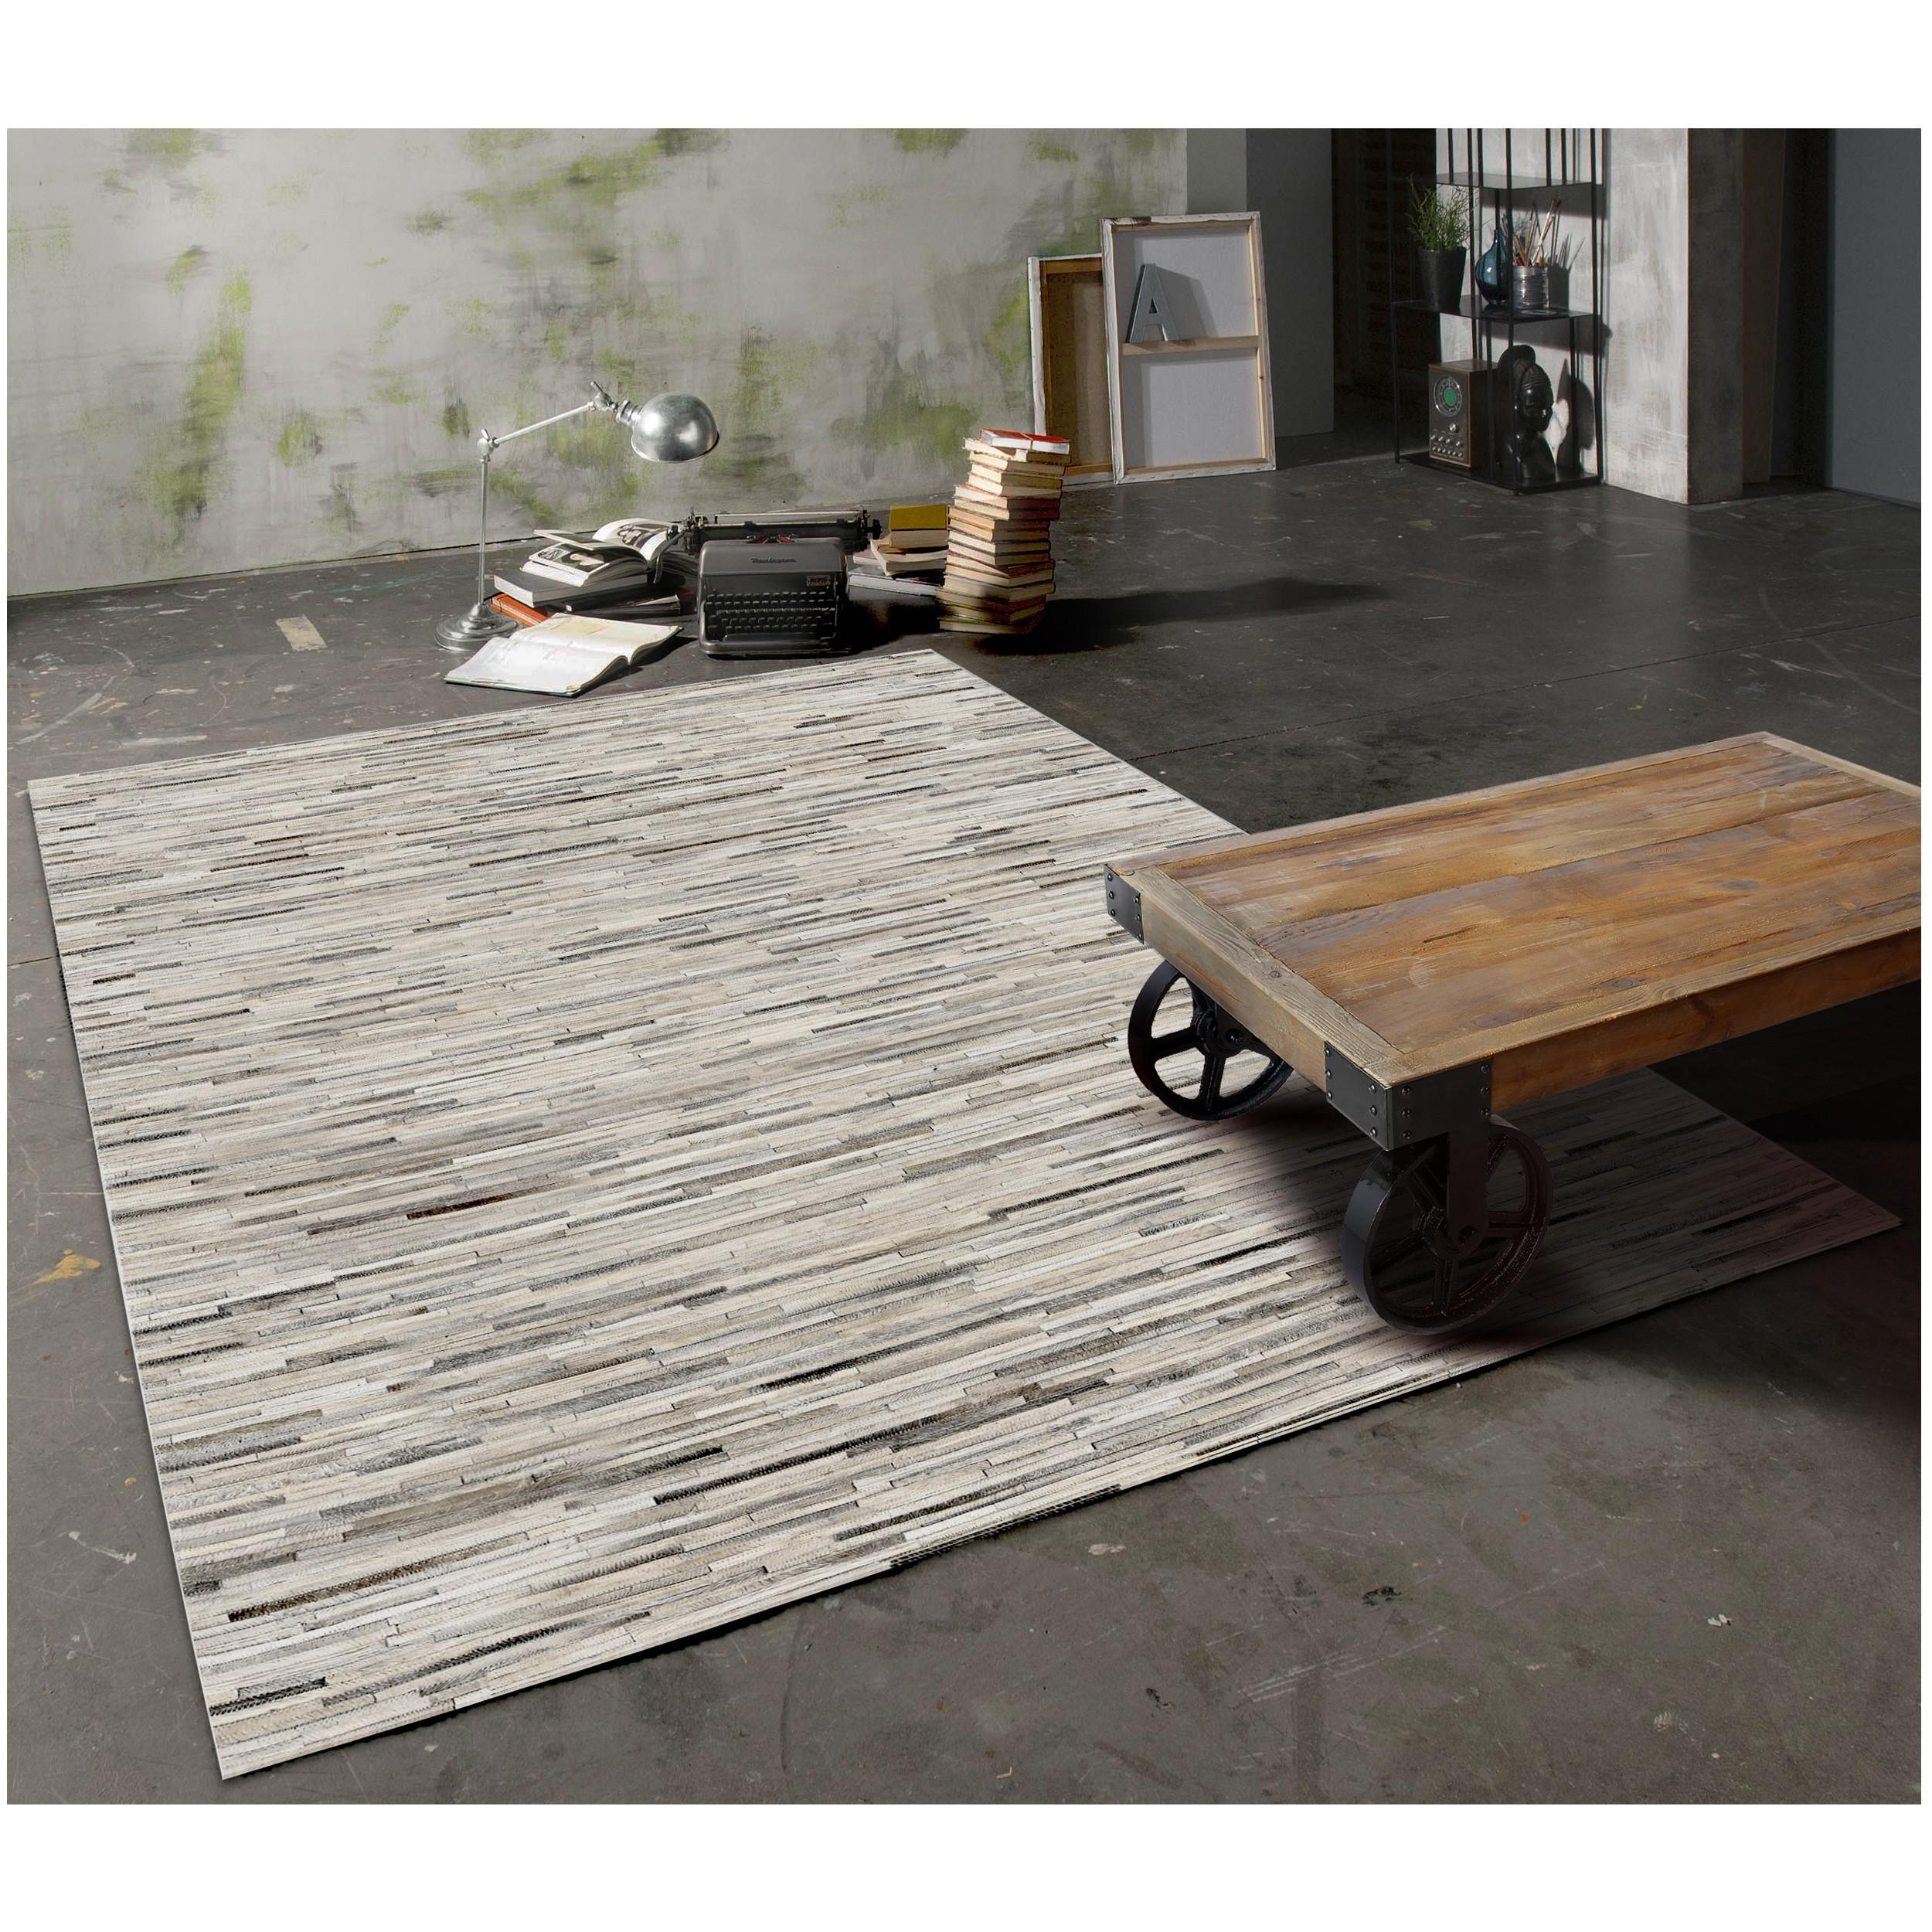 acheter tapis gris clair cuir - Tapis Gris